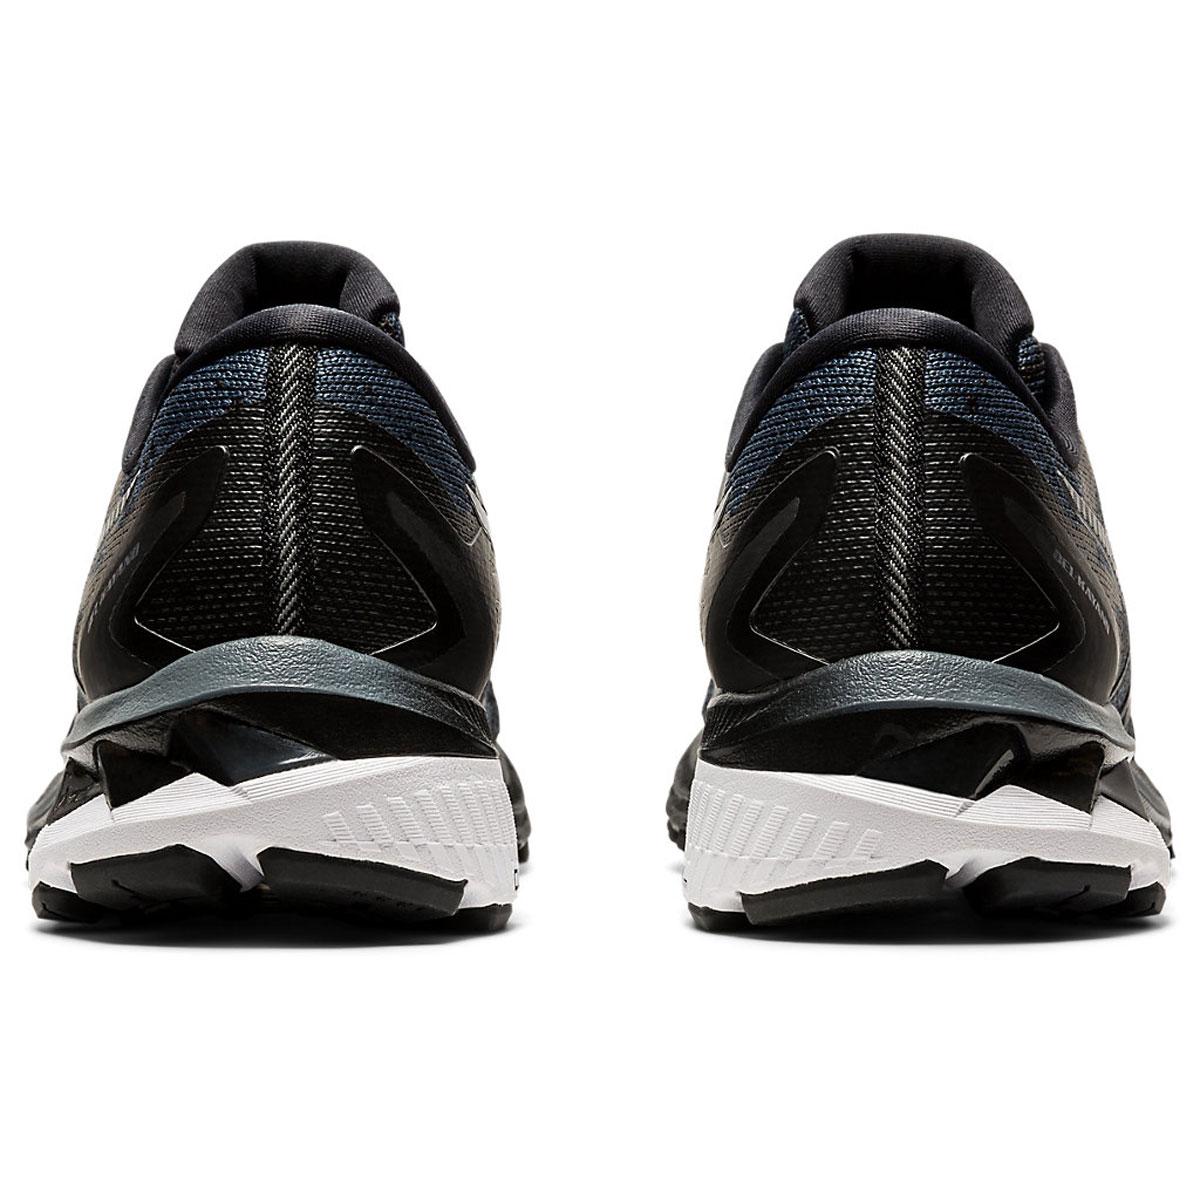 Women's Asics GEL-Kayano 27 Running Shoe - Color: Black/Pure Silv (Regular Width) - Size: 5, Black/Pure Silv, large, image 5